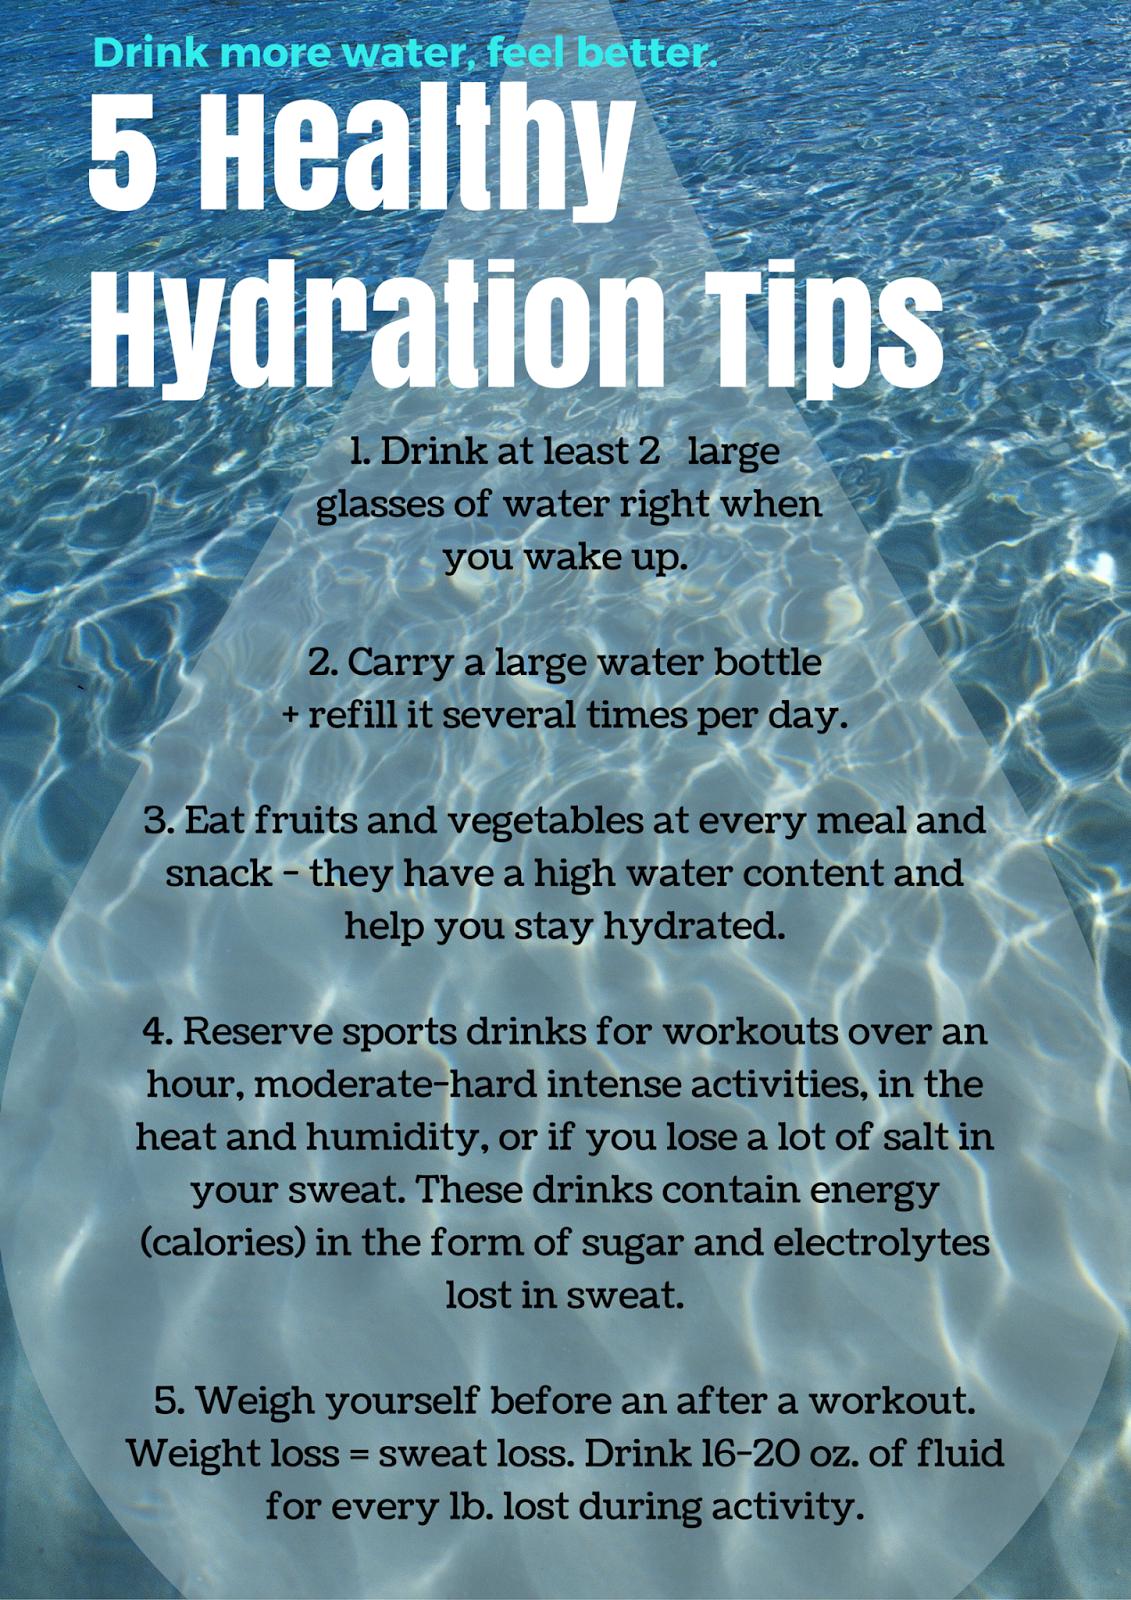 5 Healthy Hydration Tips